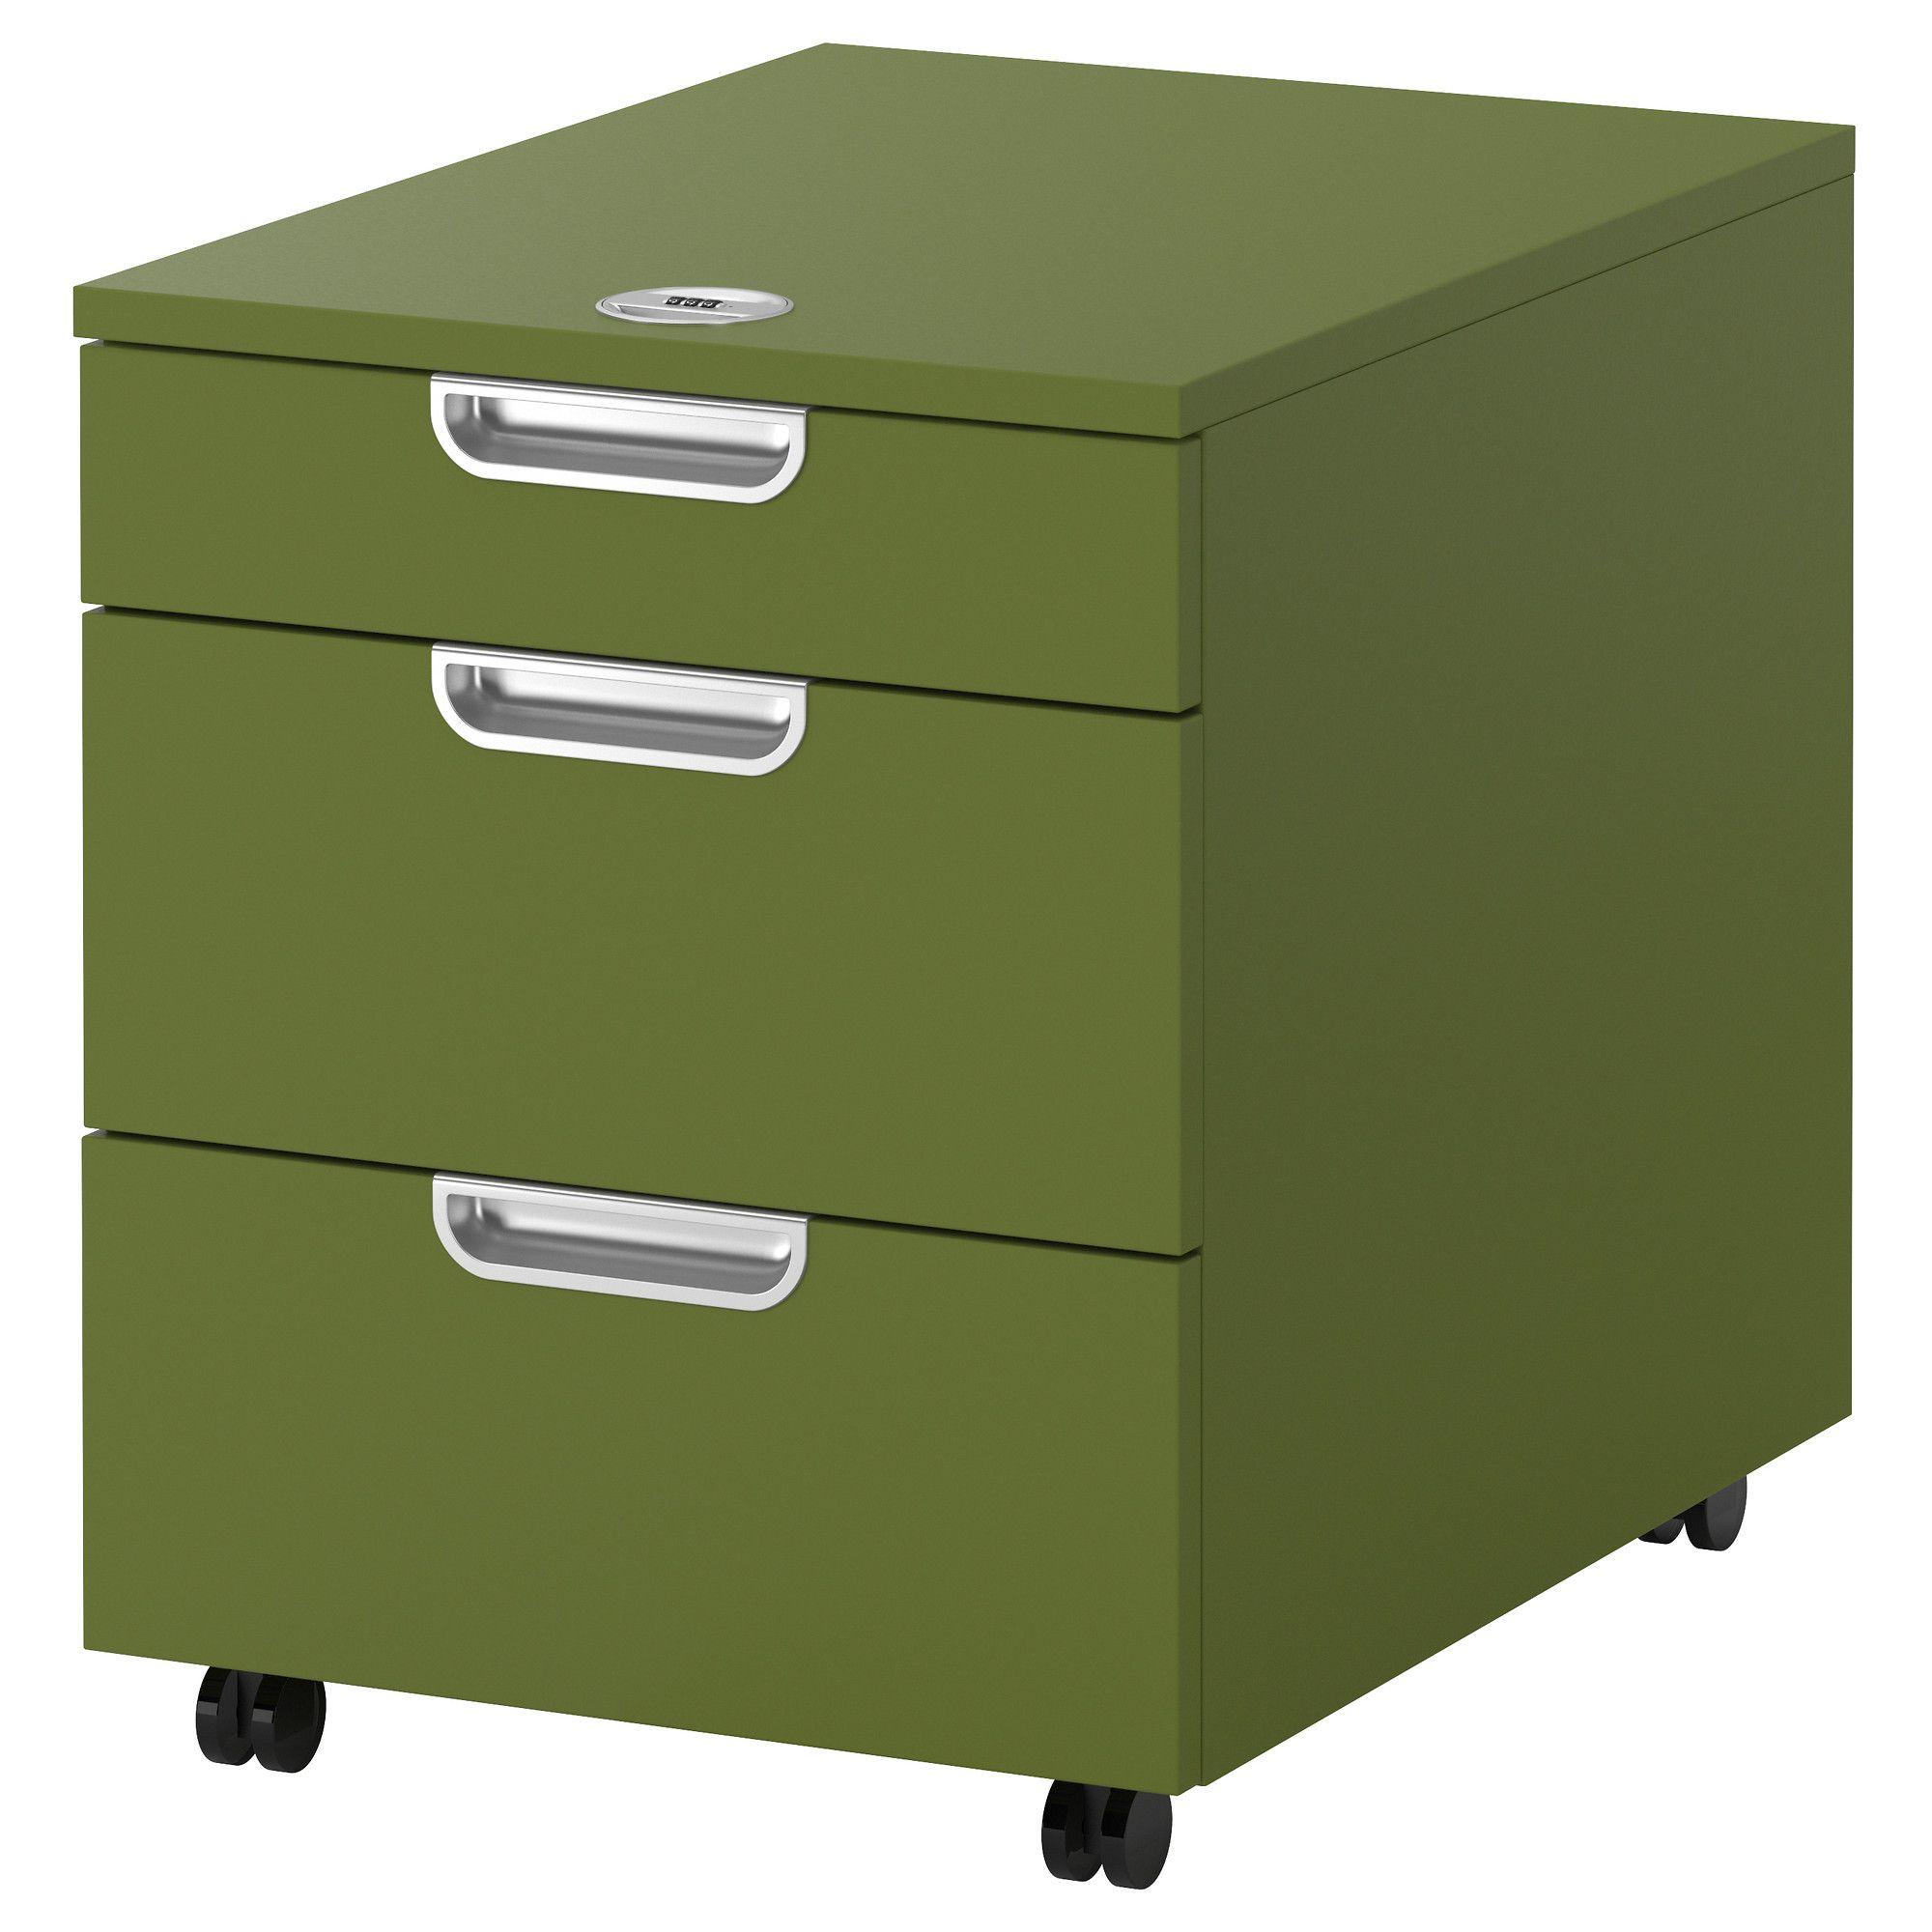 US Furniture and Home Furnishings Drawer unit, Ikea, Decor